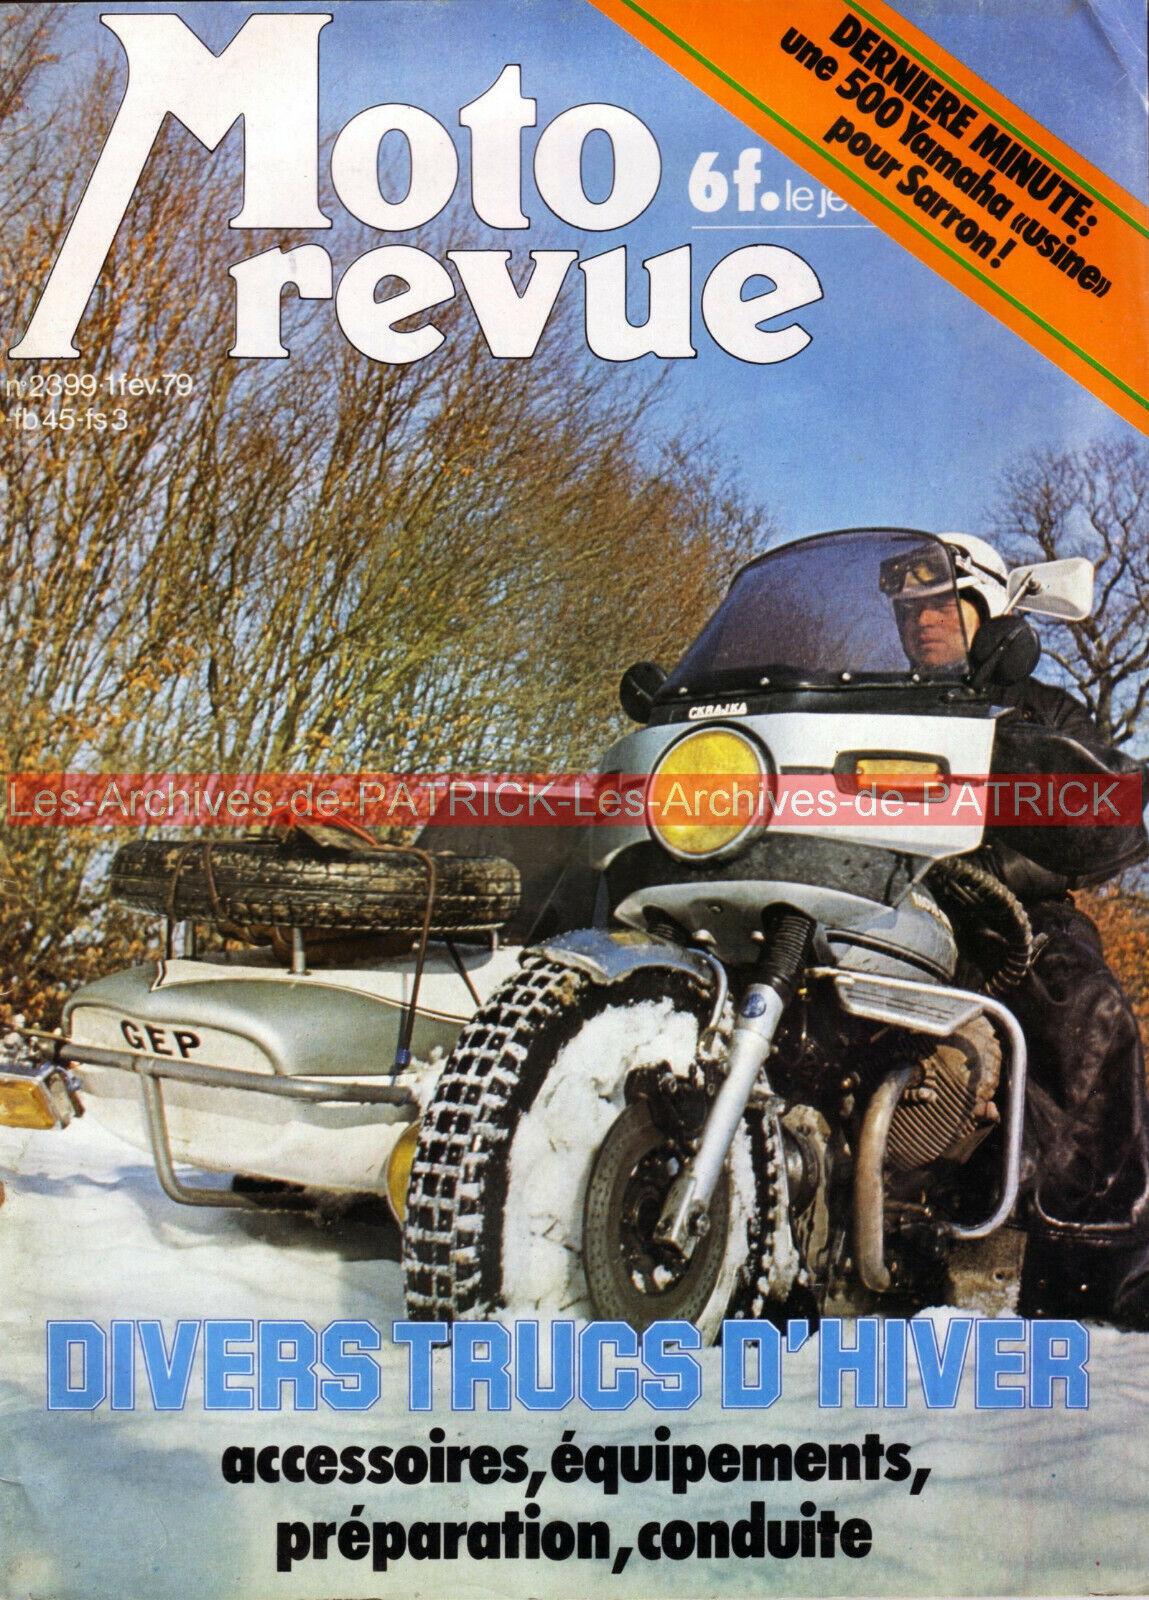 Moto revue 2398 spécial « chopper » ; suzuki rm 125 n ; pocket bike 1979